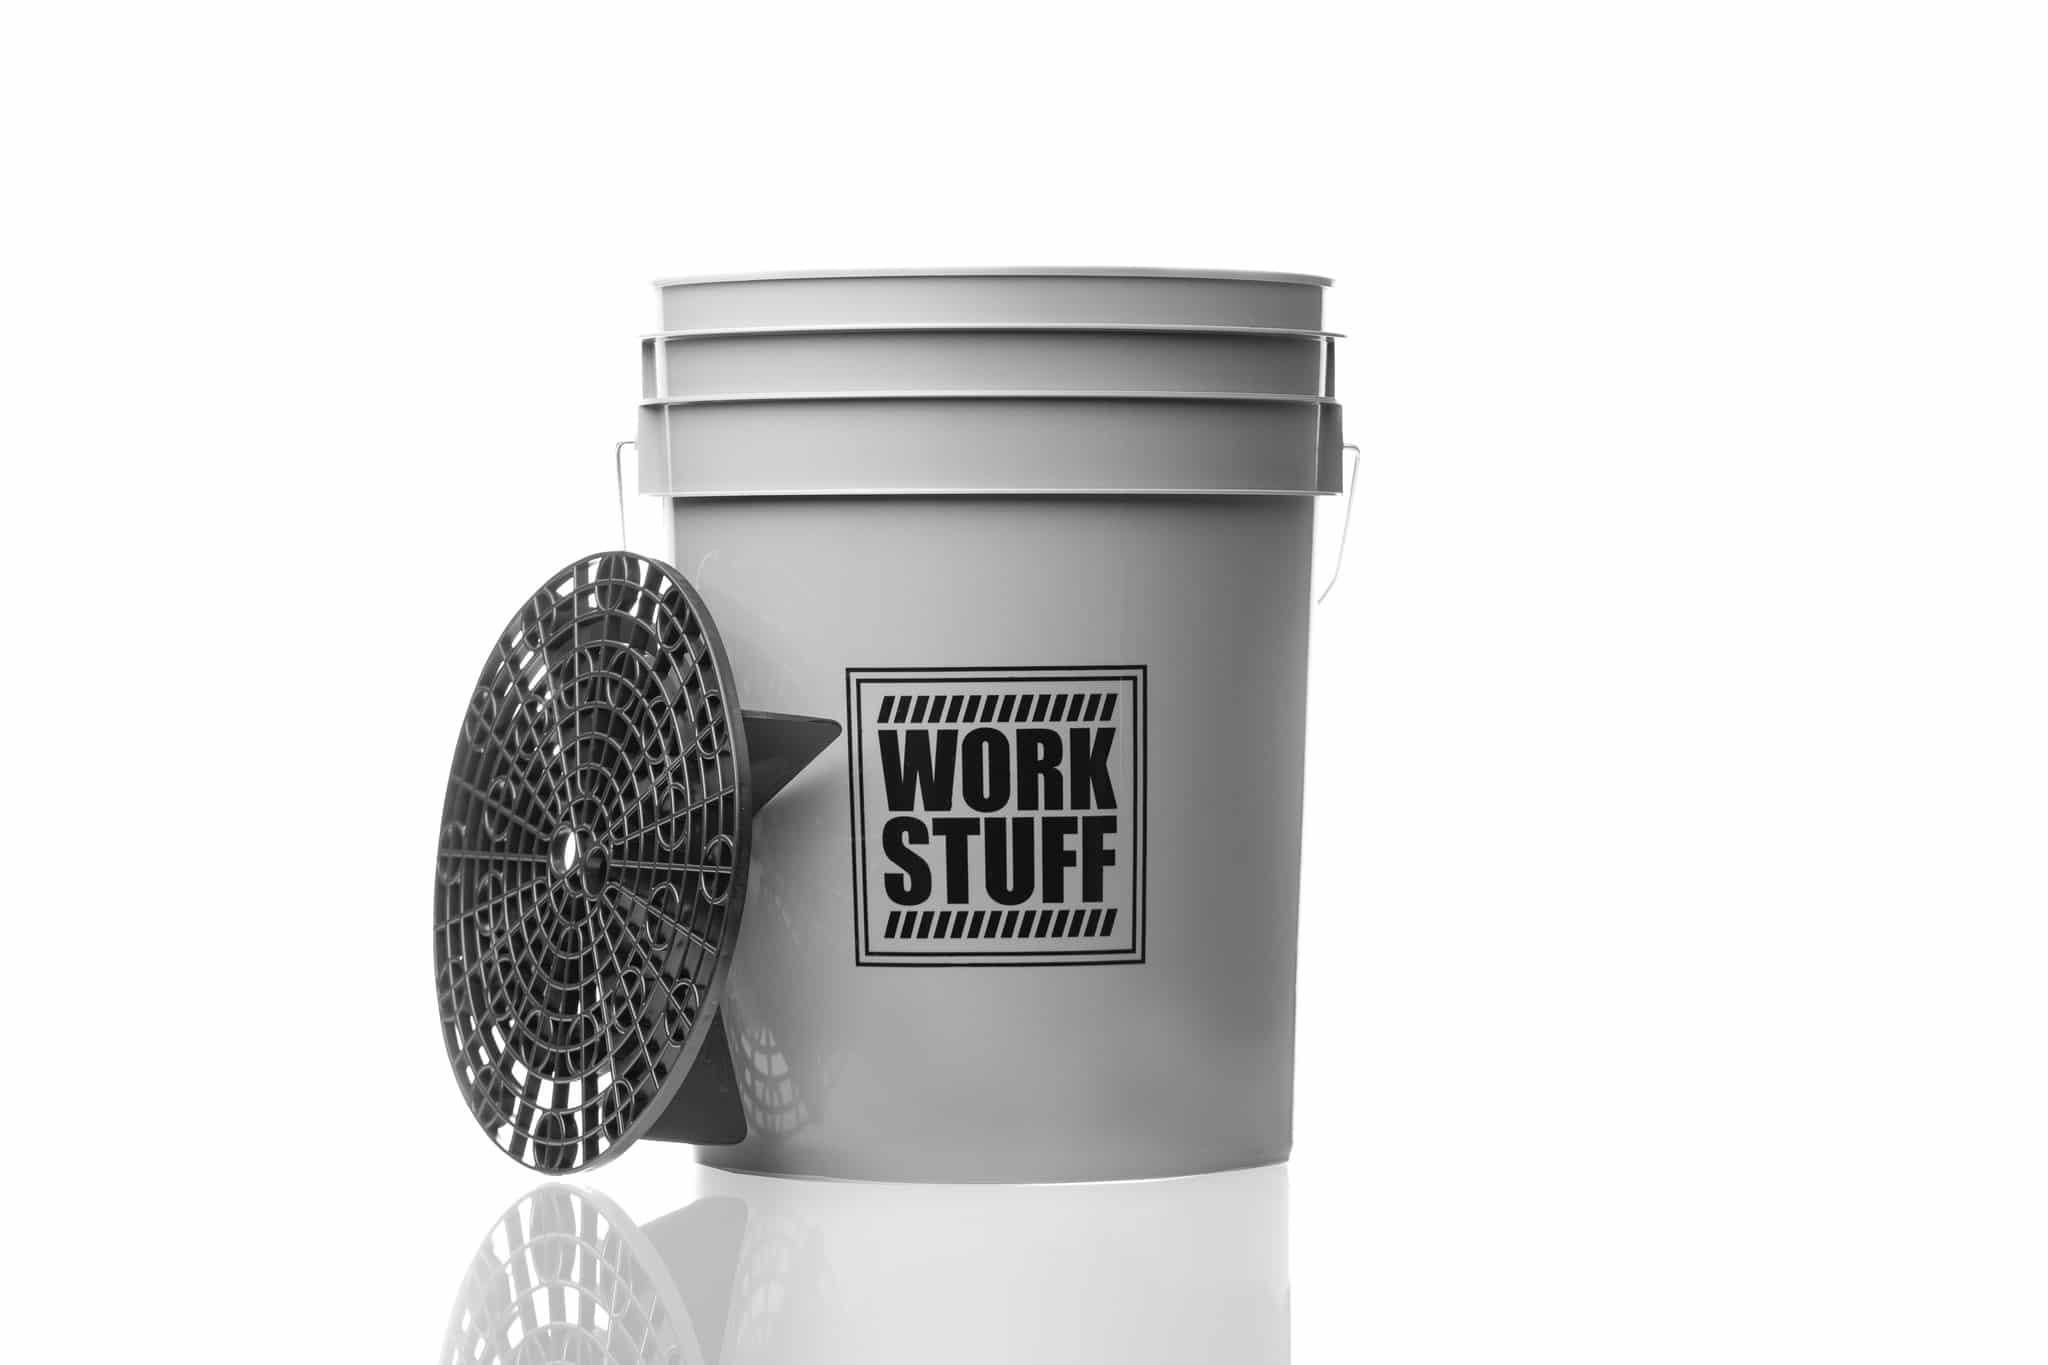 work-stuff-bucket-wheels-grit two bucket wash